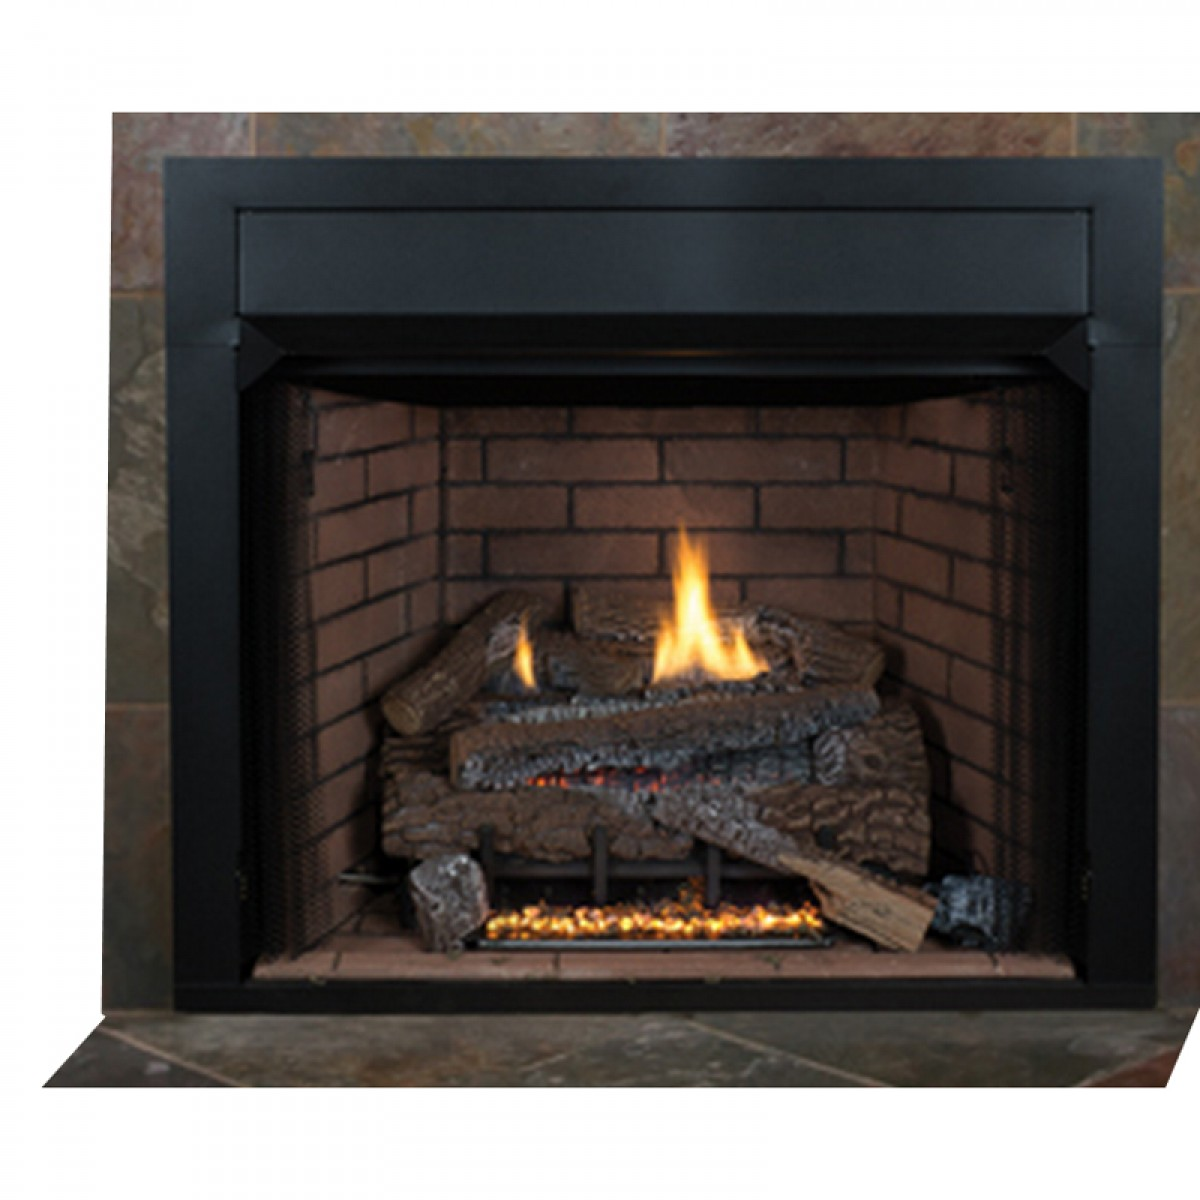 Ihp Superior Vrt4032zmn 32 Quot Ng Ventfree Mv Fireplace